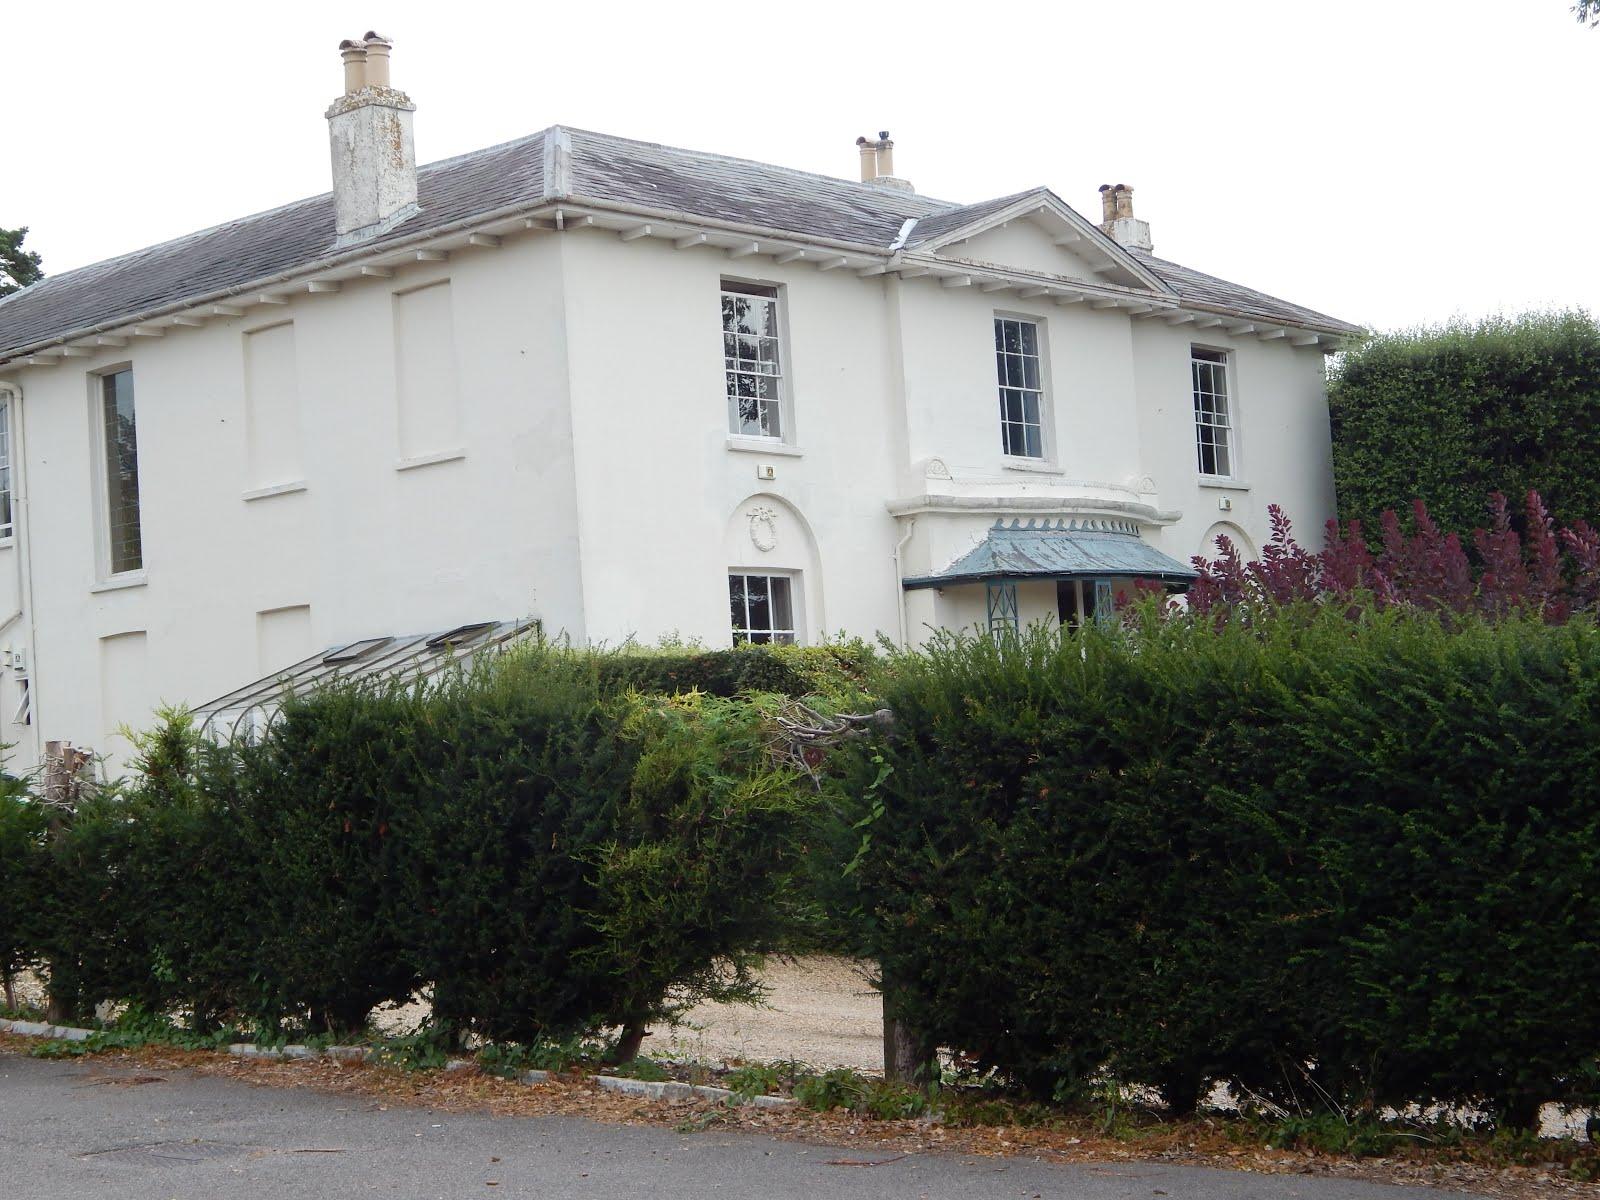 The Old Rectory Farlington